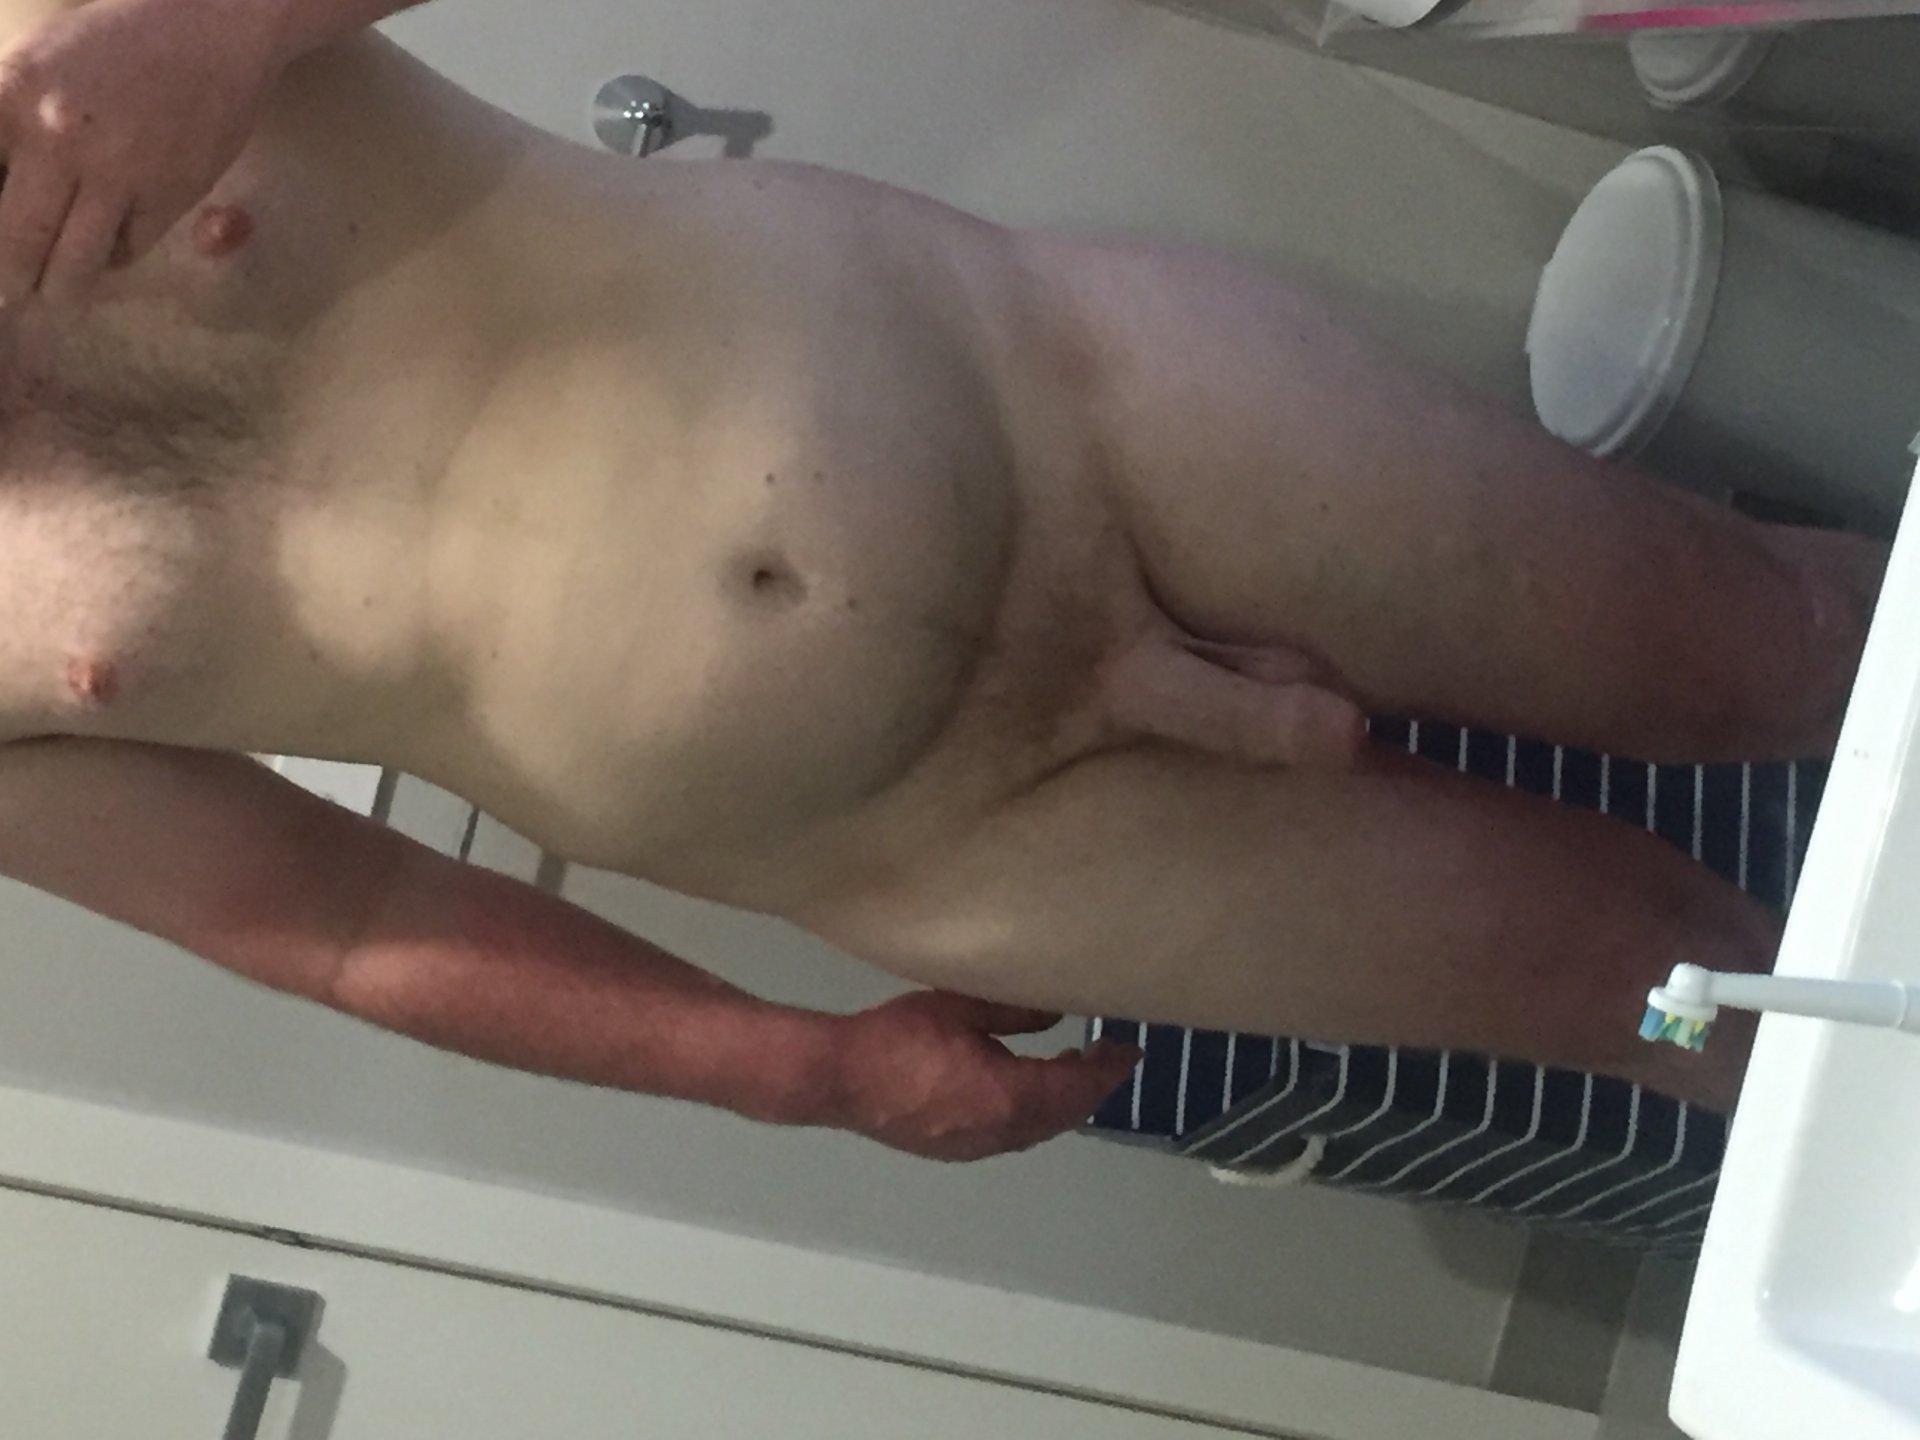 Bigj169  from Victoria,Australia